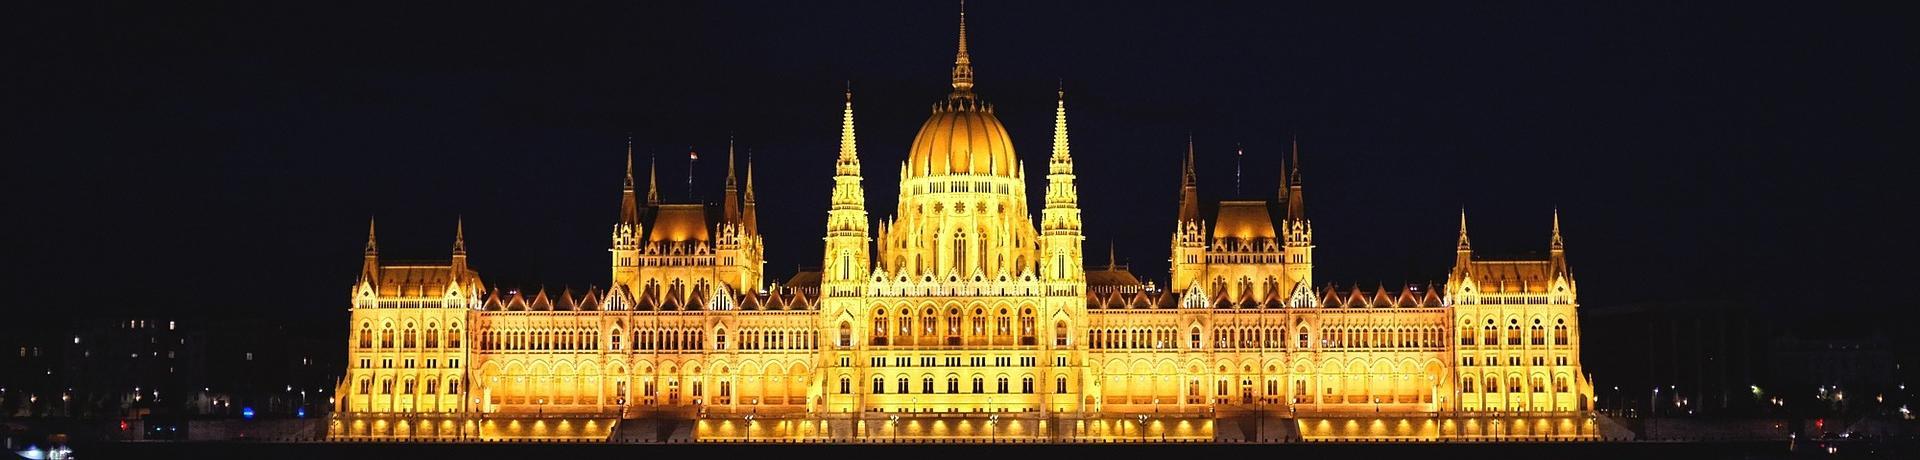 budapest-705825-1920.jpg